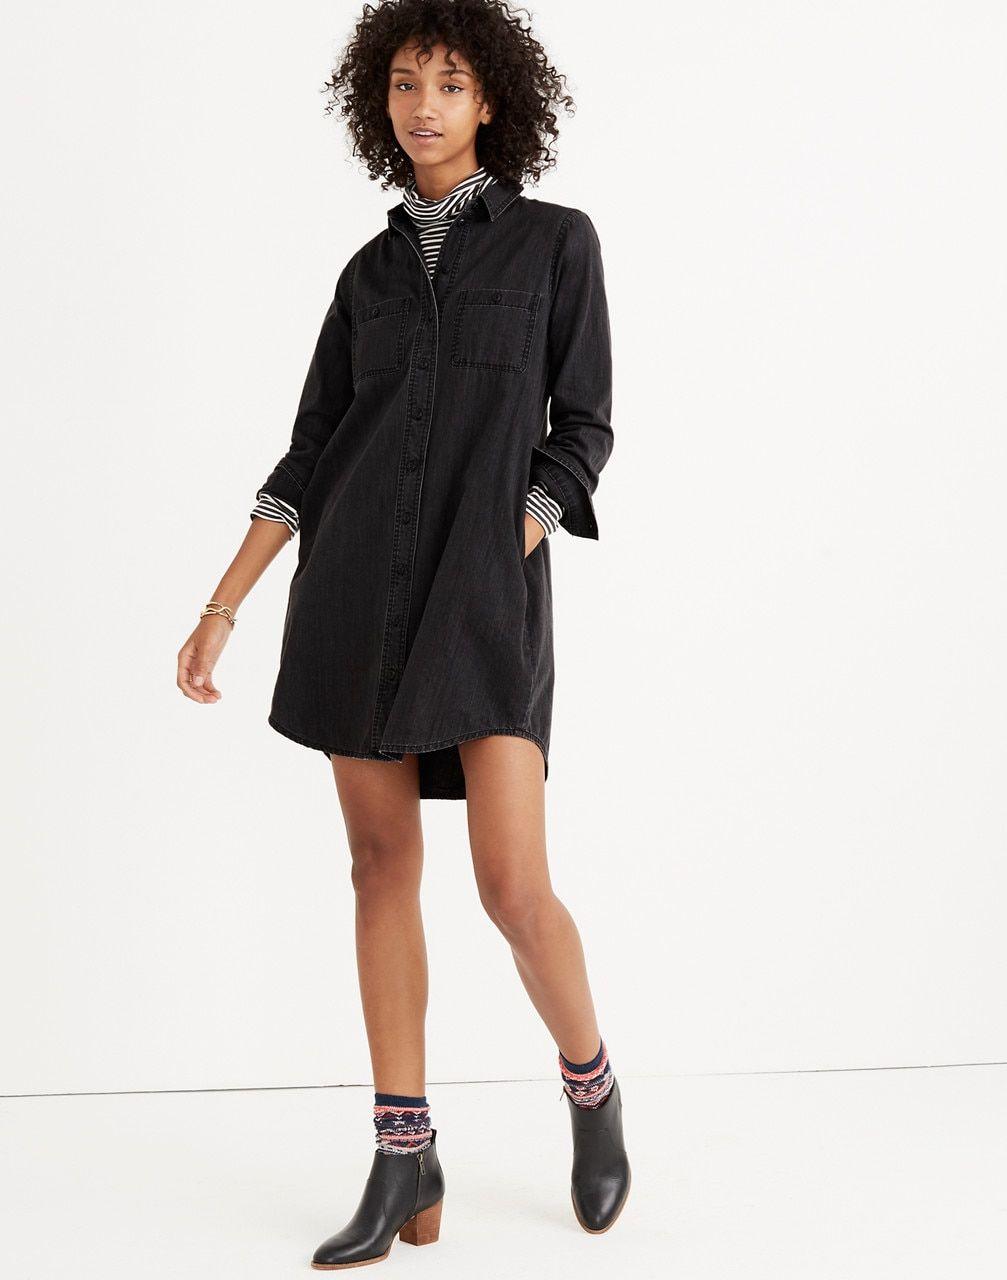 Women's Black Denim Shirtdress | Black denim shirt, Shirt dress ...